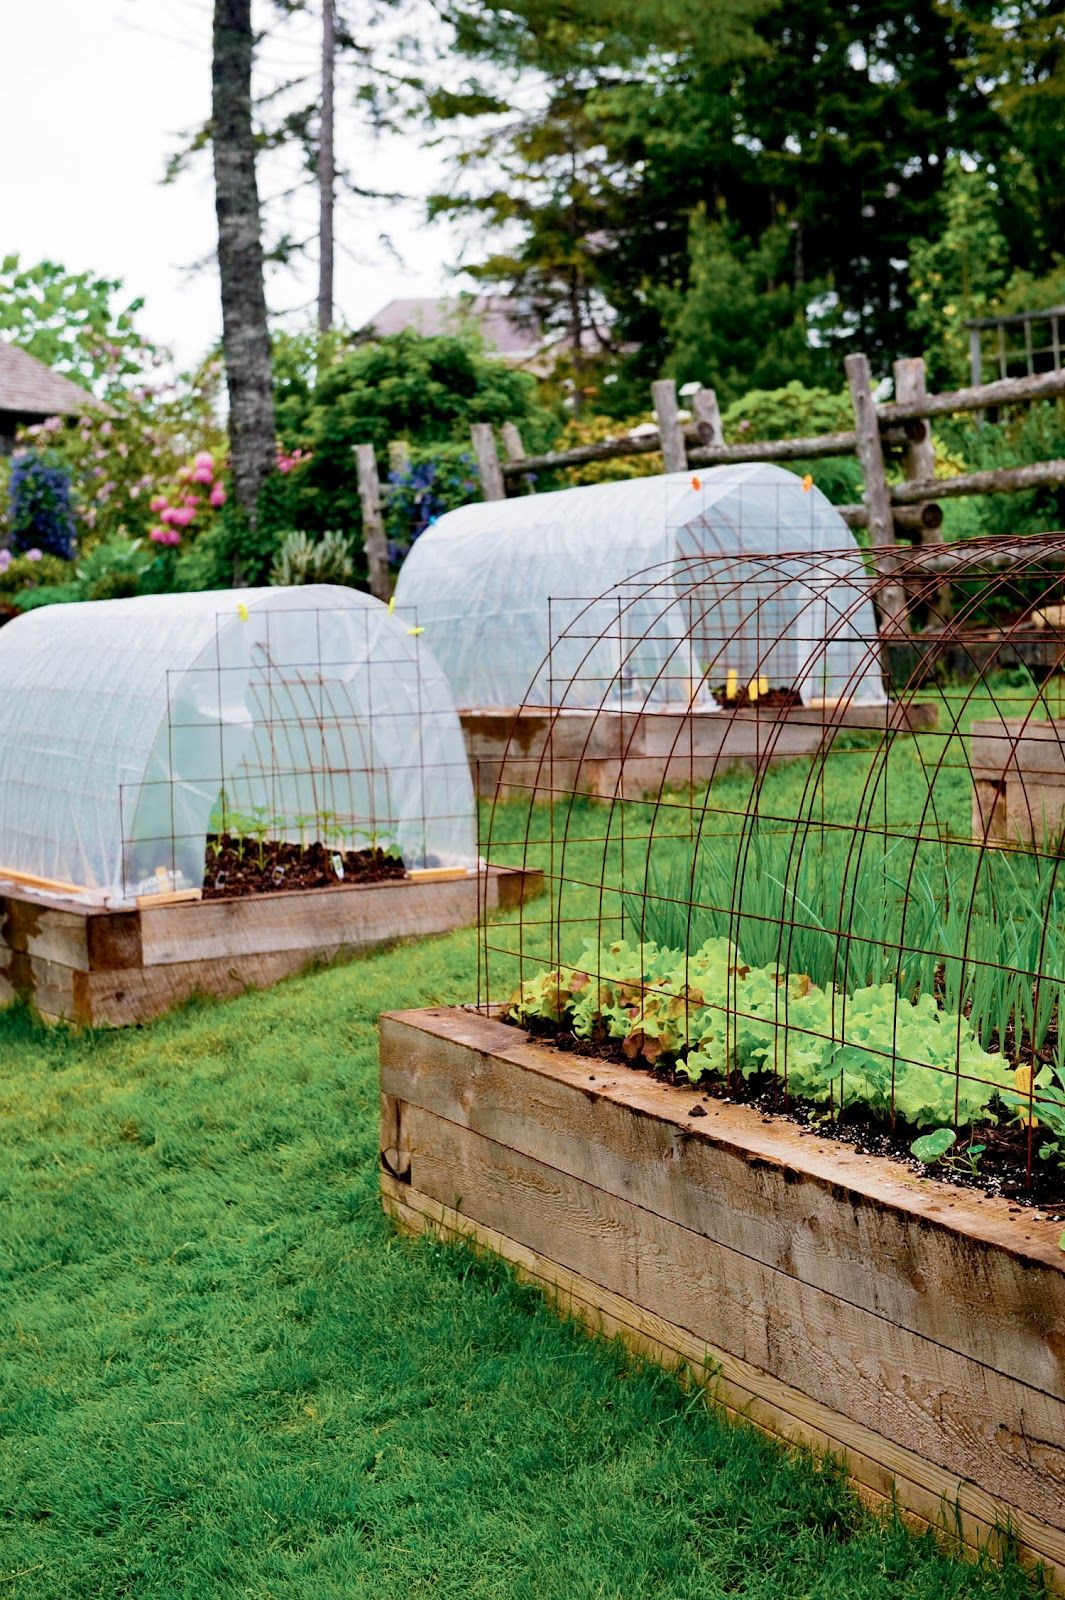 Niki Jabbour - The Year Round Veggie Gardener: Mini Hoop Tunnels in Summer -   22 garden beds on a hill ideas